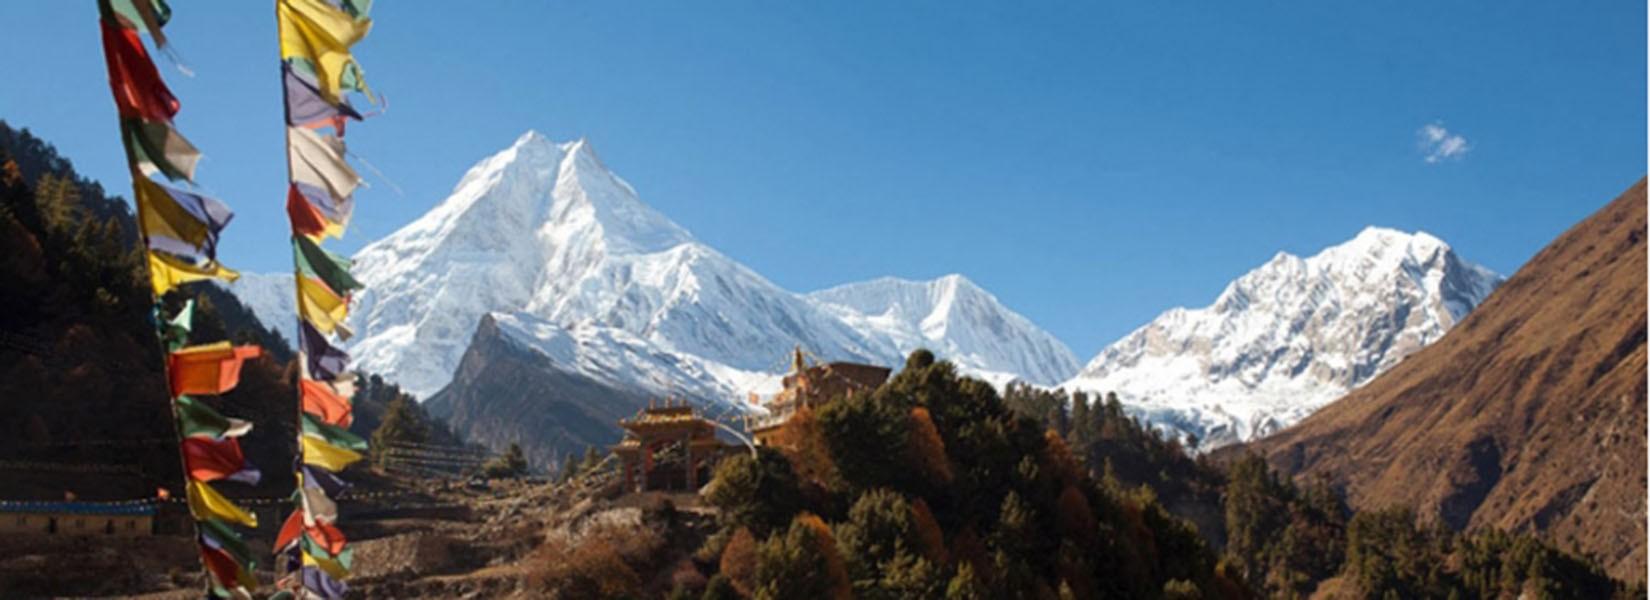 Manaslu Trek Region Banner Image